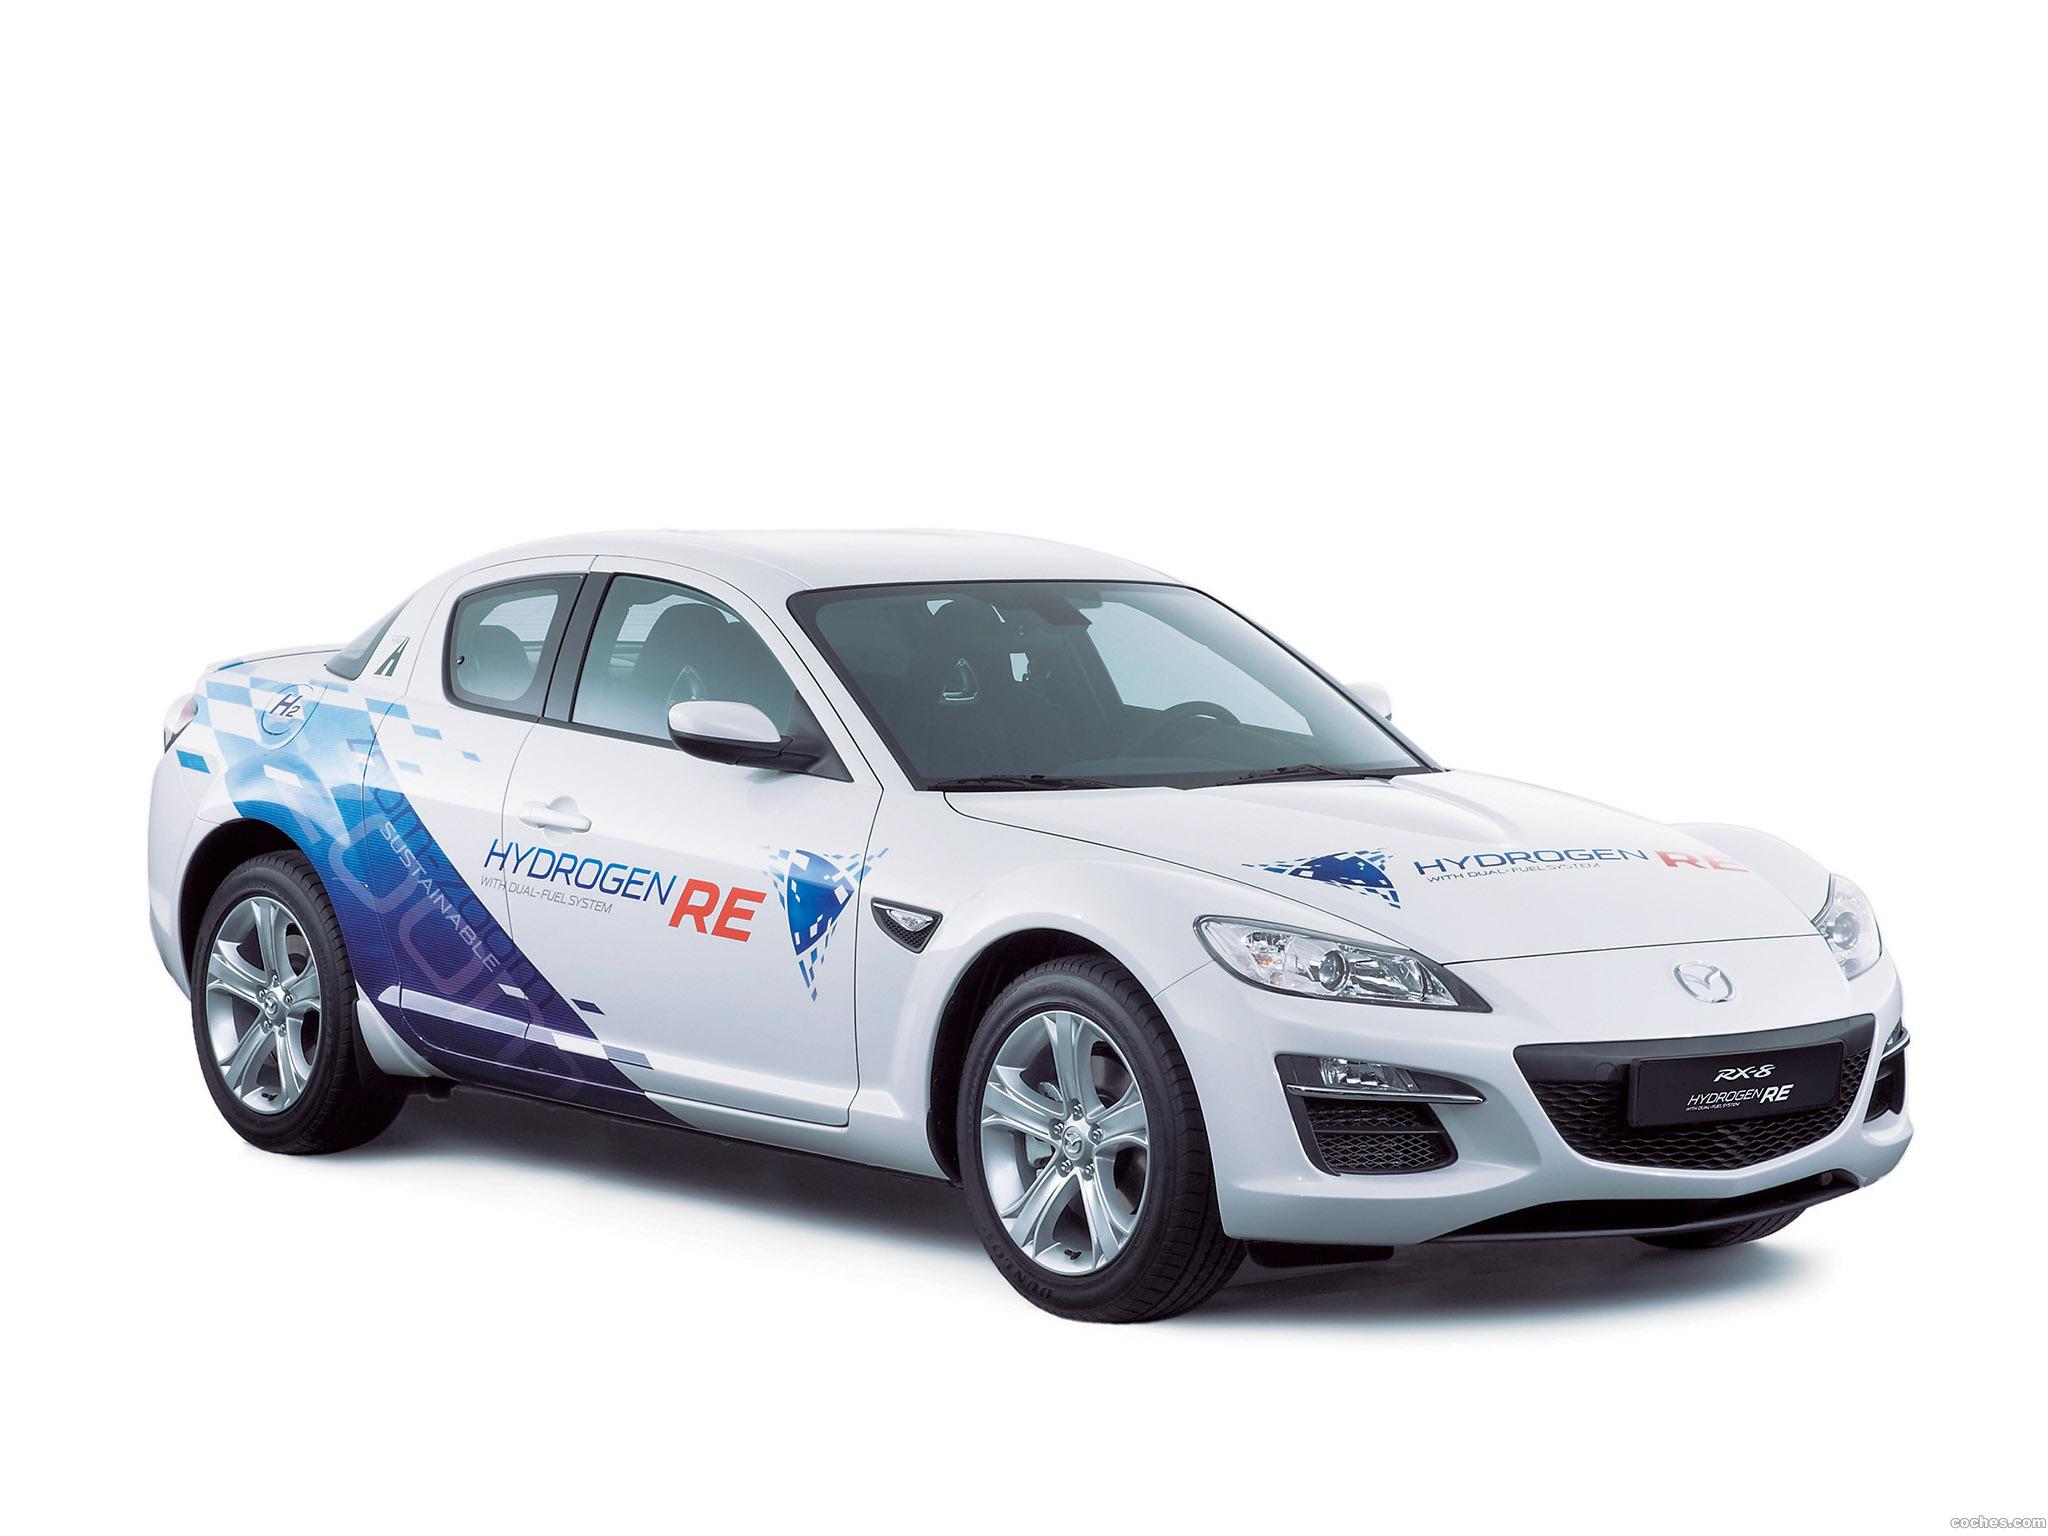 Foto 2 de Mazda RX-8 Hydrogen Re Dual Fuel System 2009